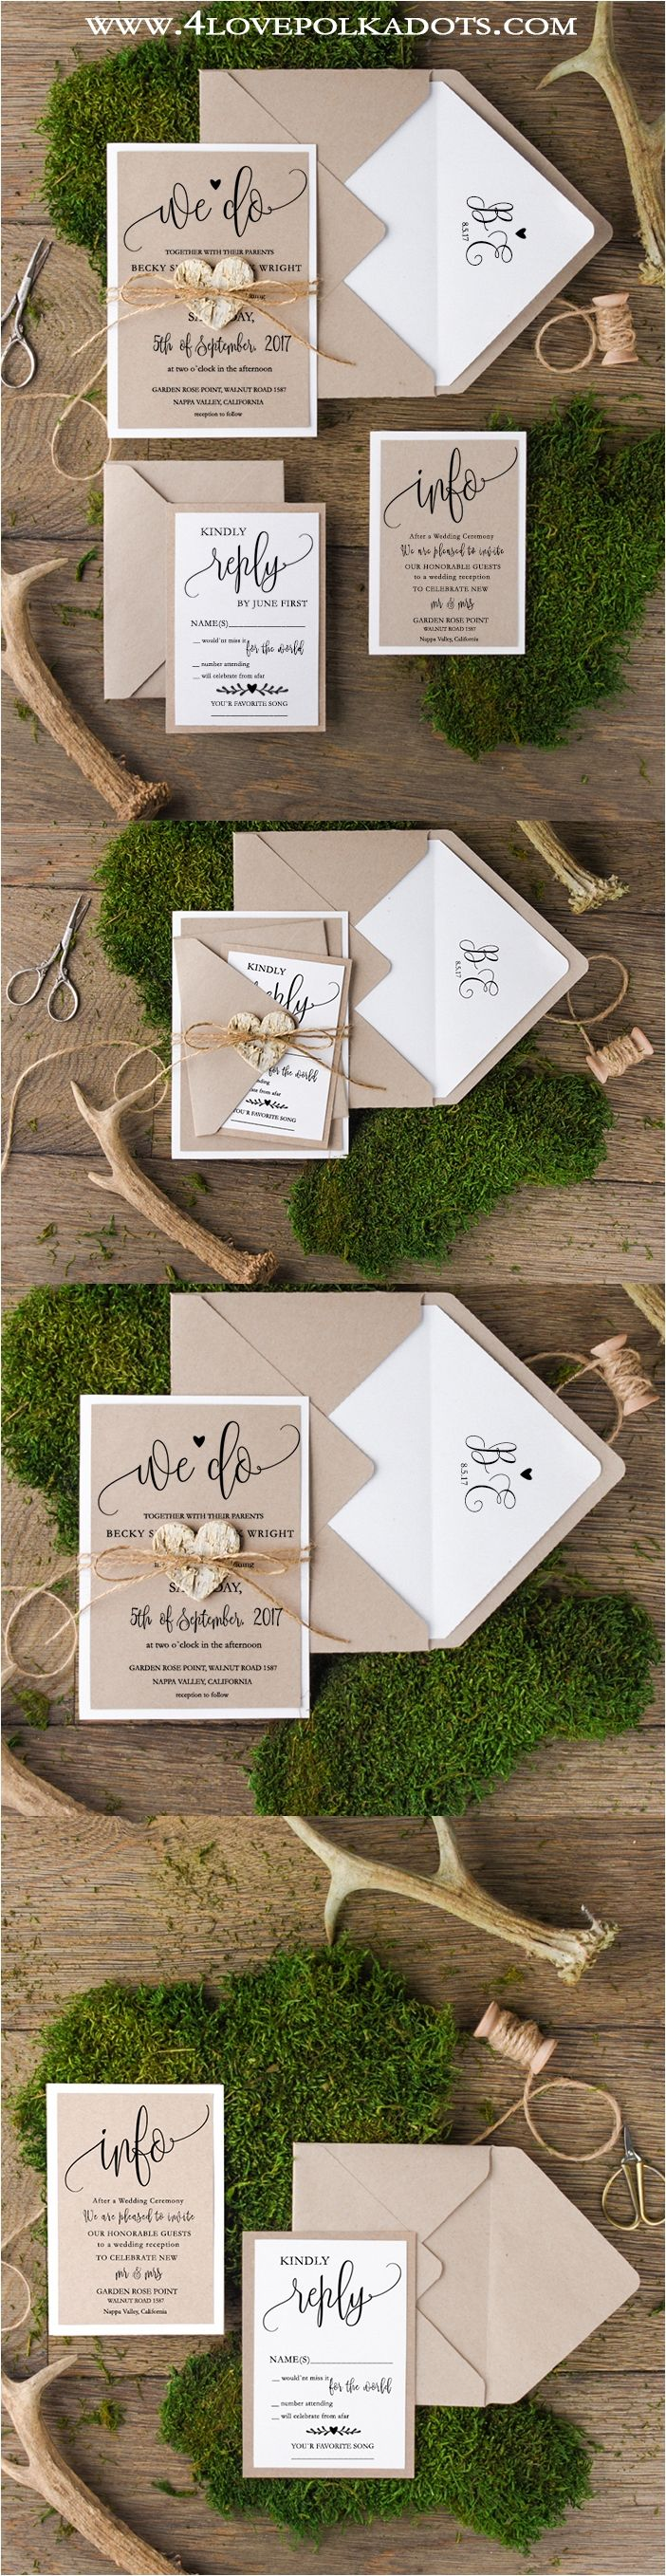 Rustic Wedding Invitation Inspiration For Your Rustic Wedding Https Bridalore C Wedding Invitations Rustic Wedding Invitation Inspiration Wedding Invitations